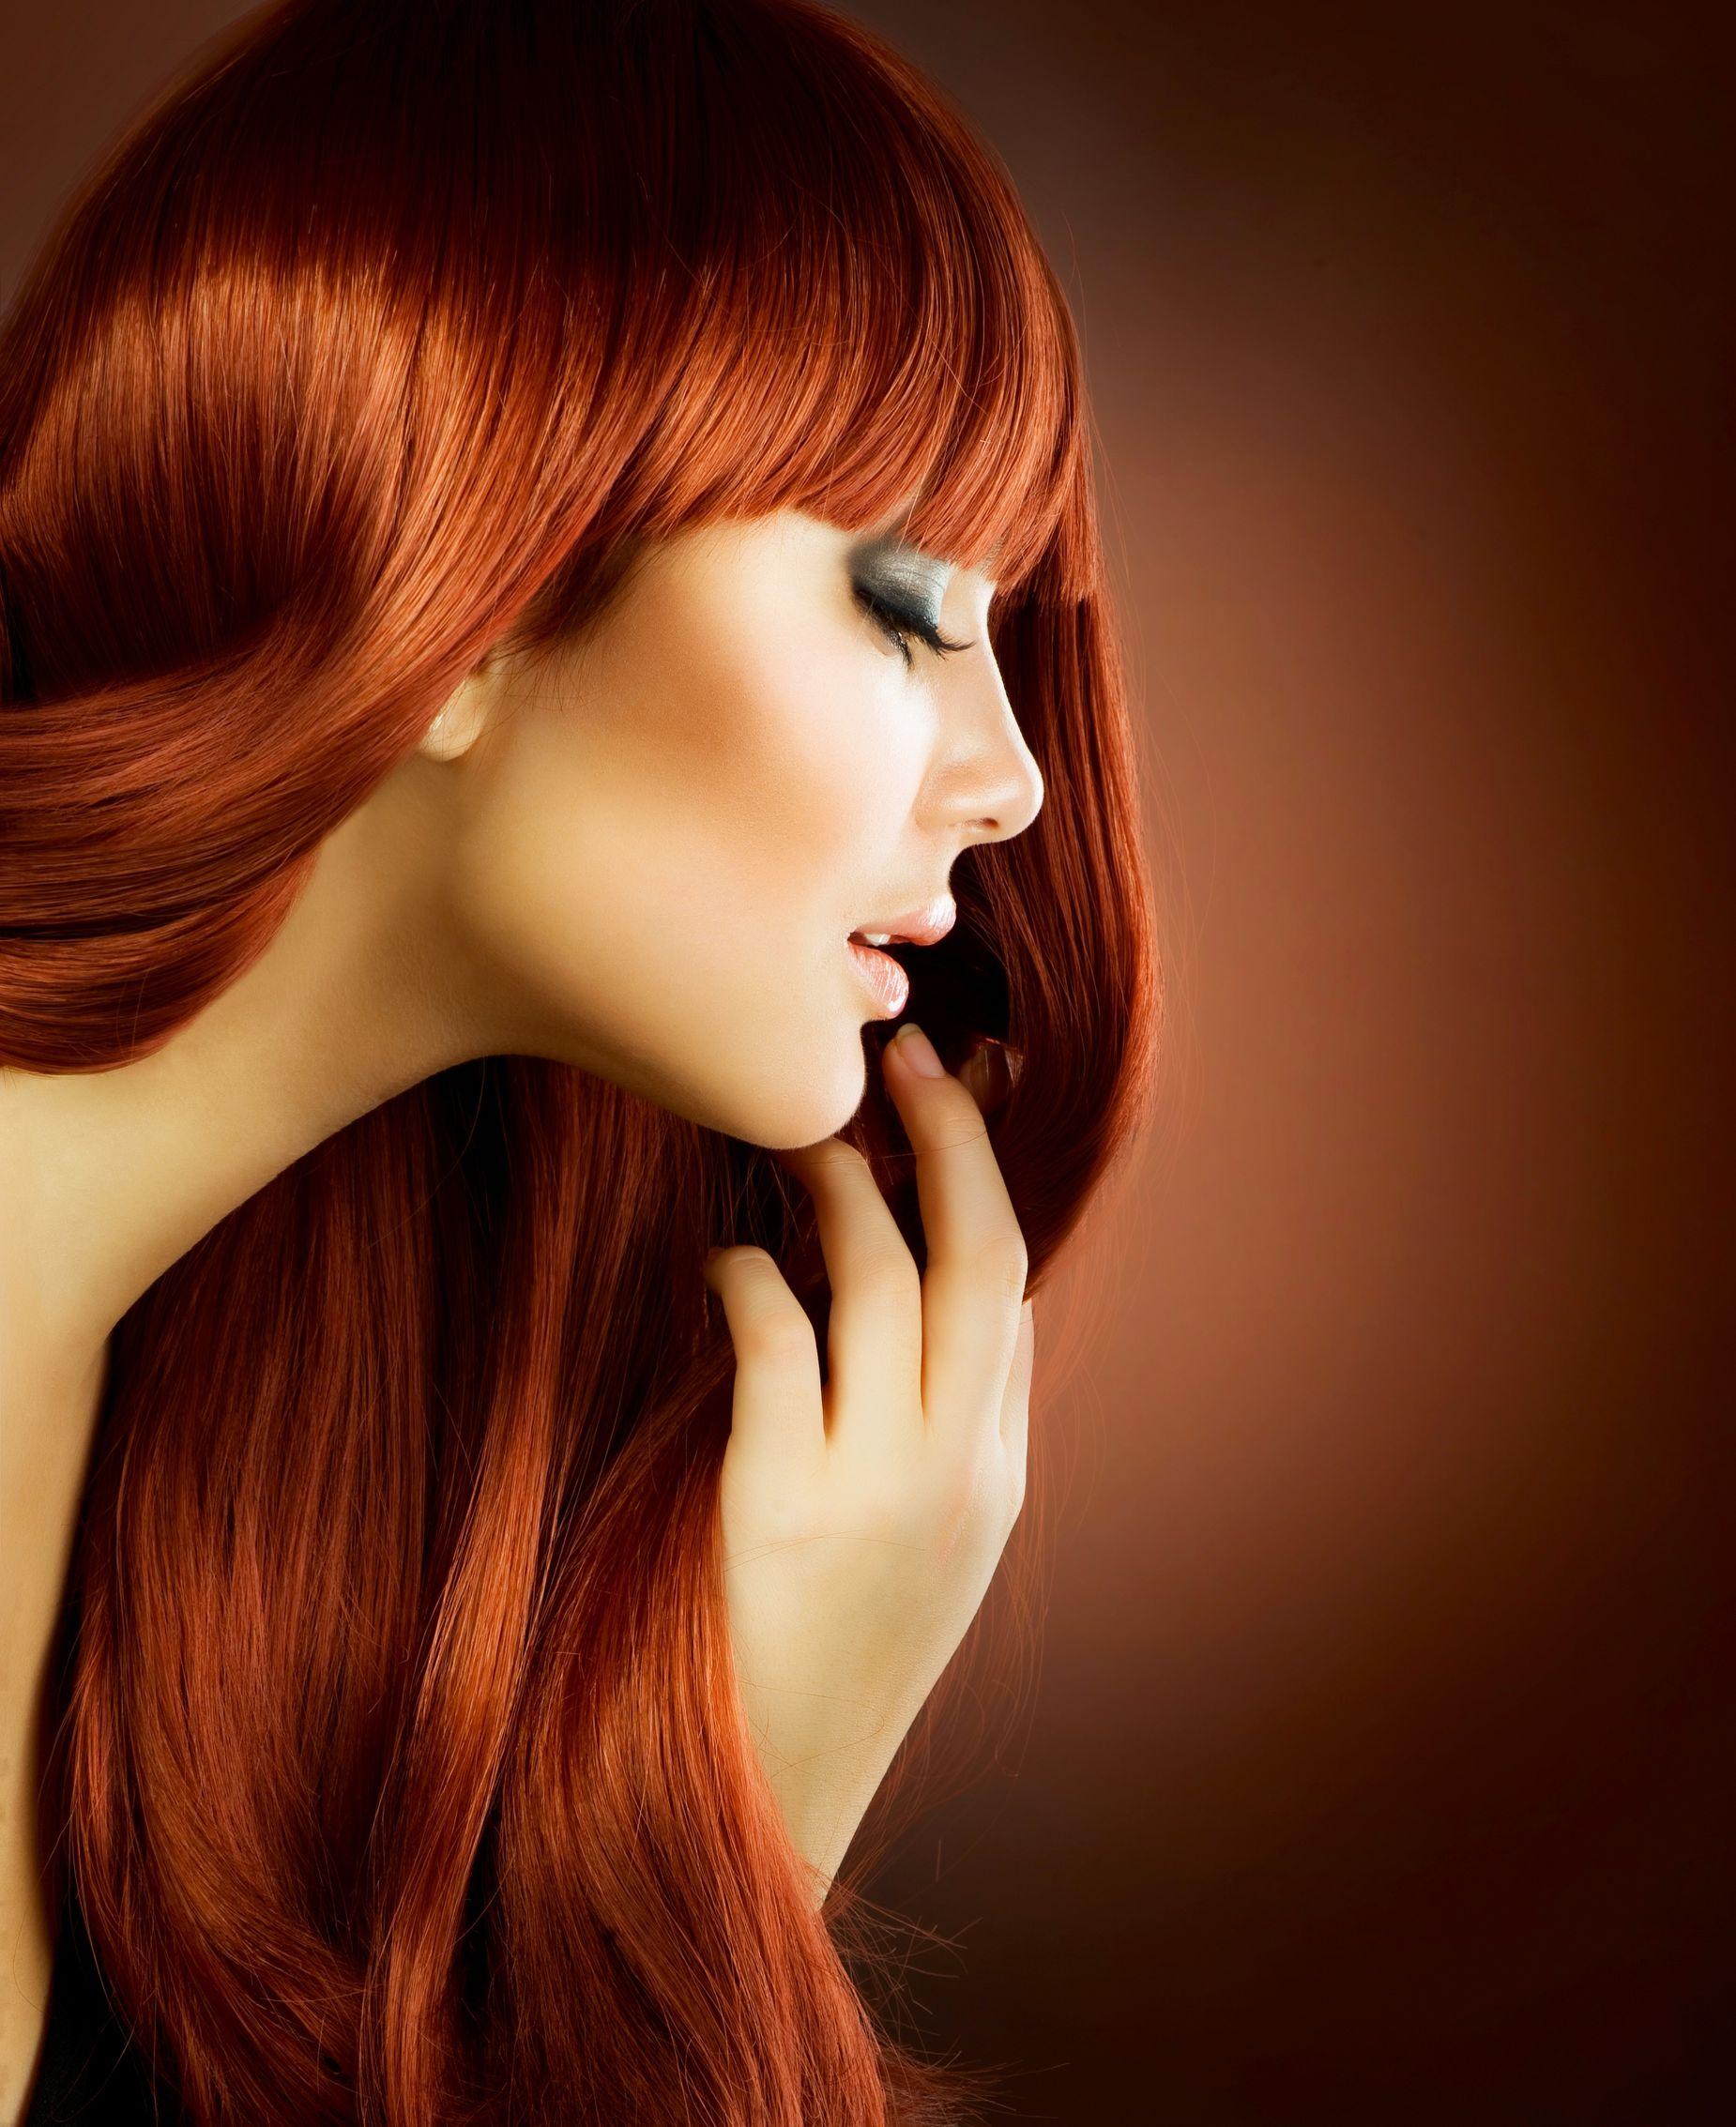 Removing facial hair for men